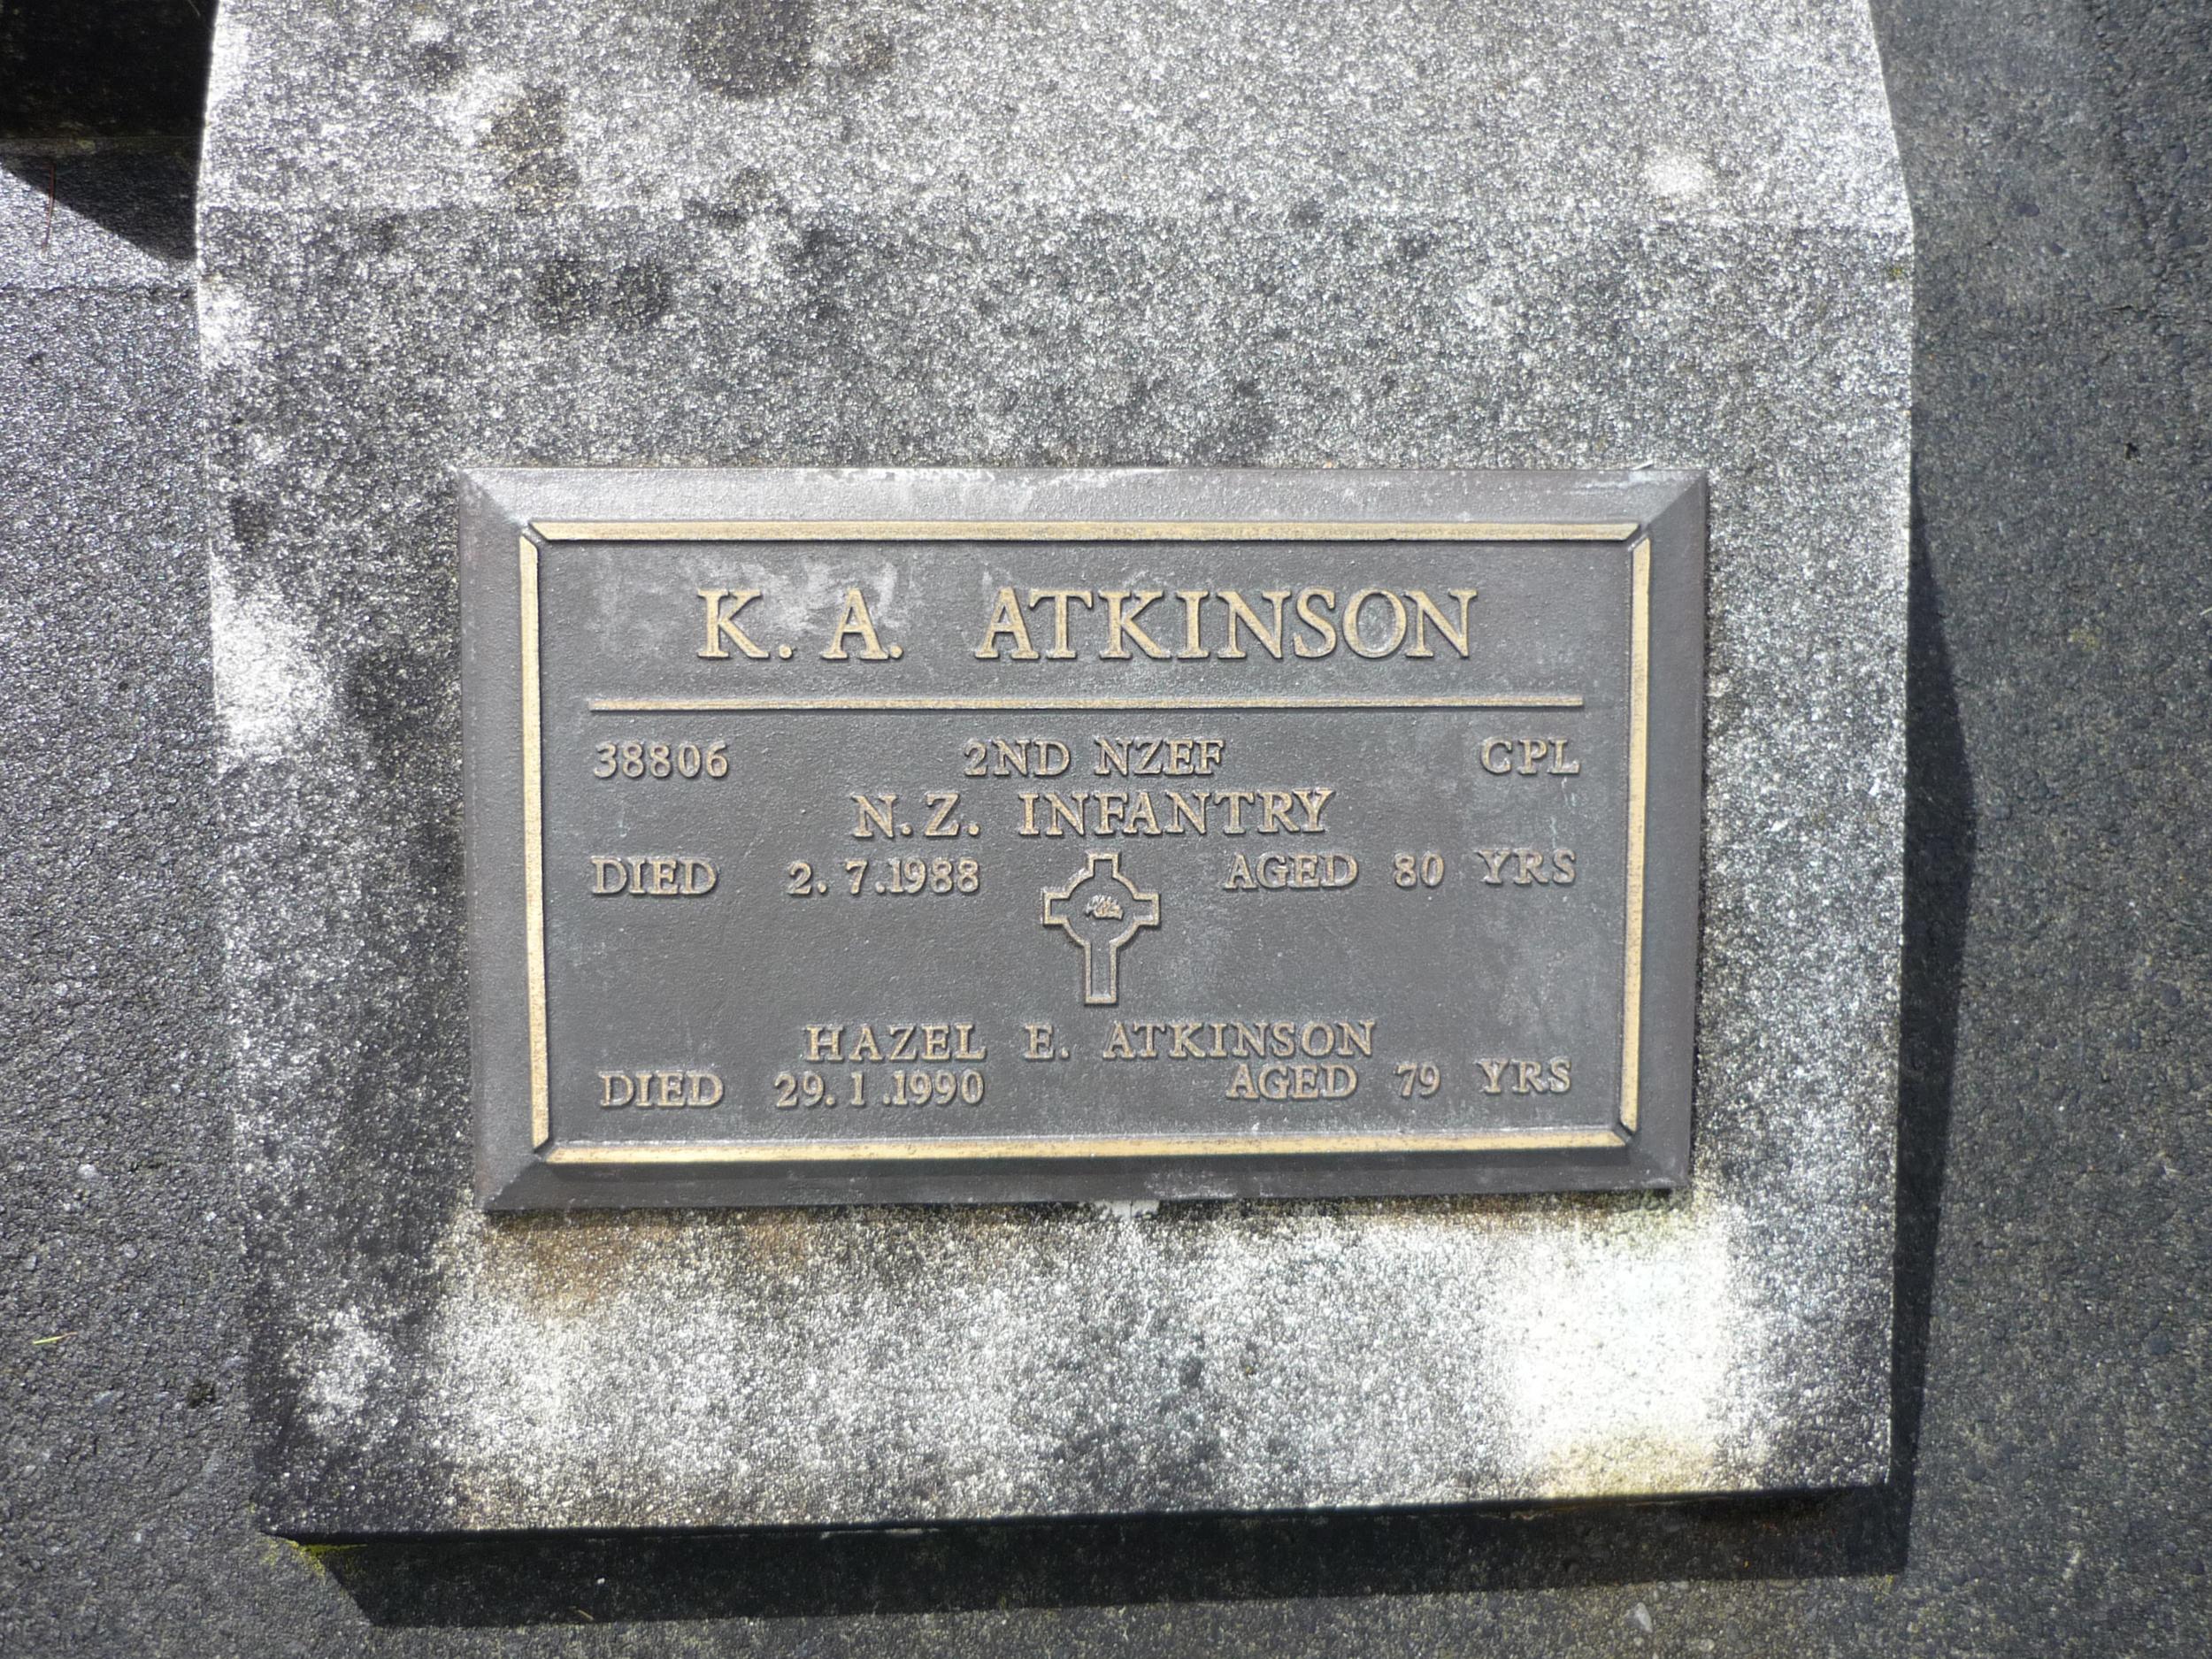 Memorials to Keith Armstrong Atkinson and Hazel Emily Atkinson (nee McCauley/ Anderson)